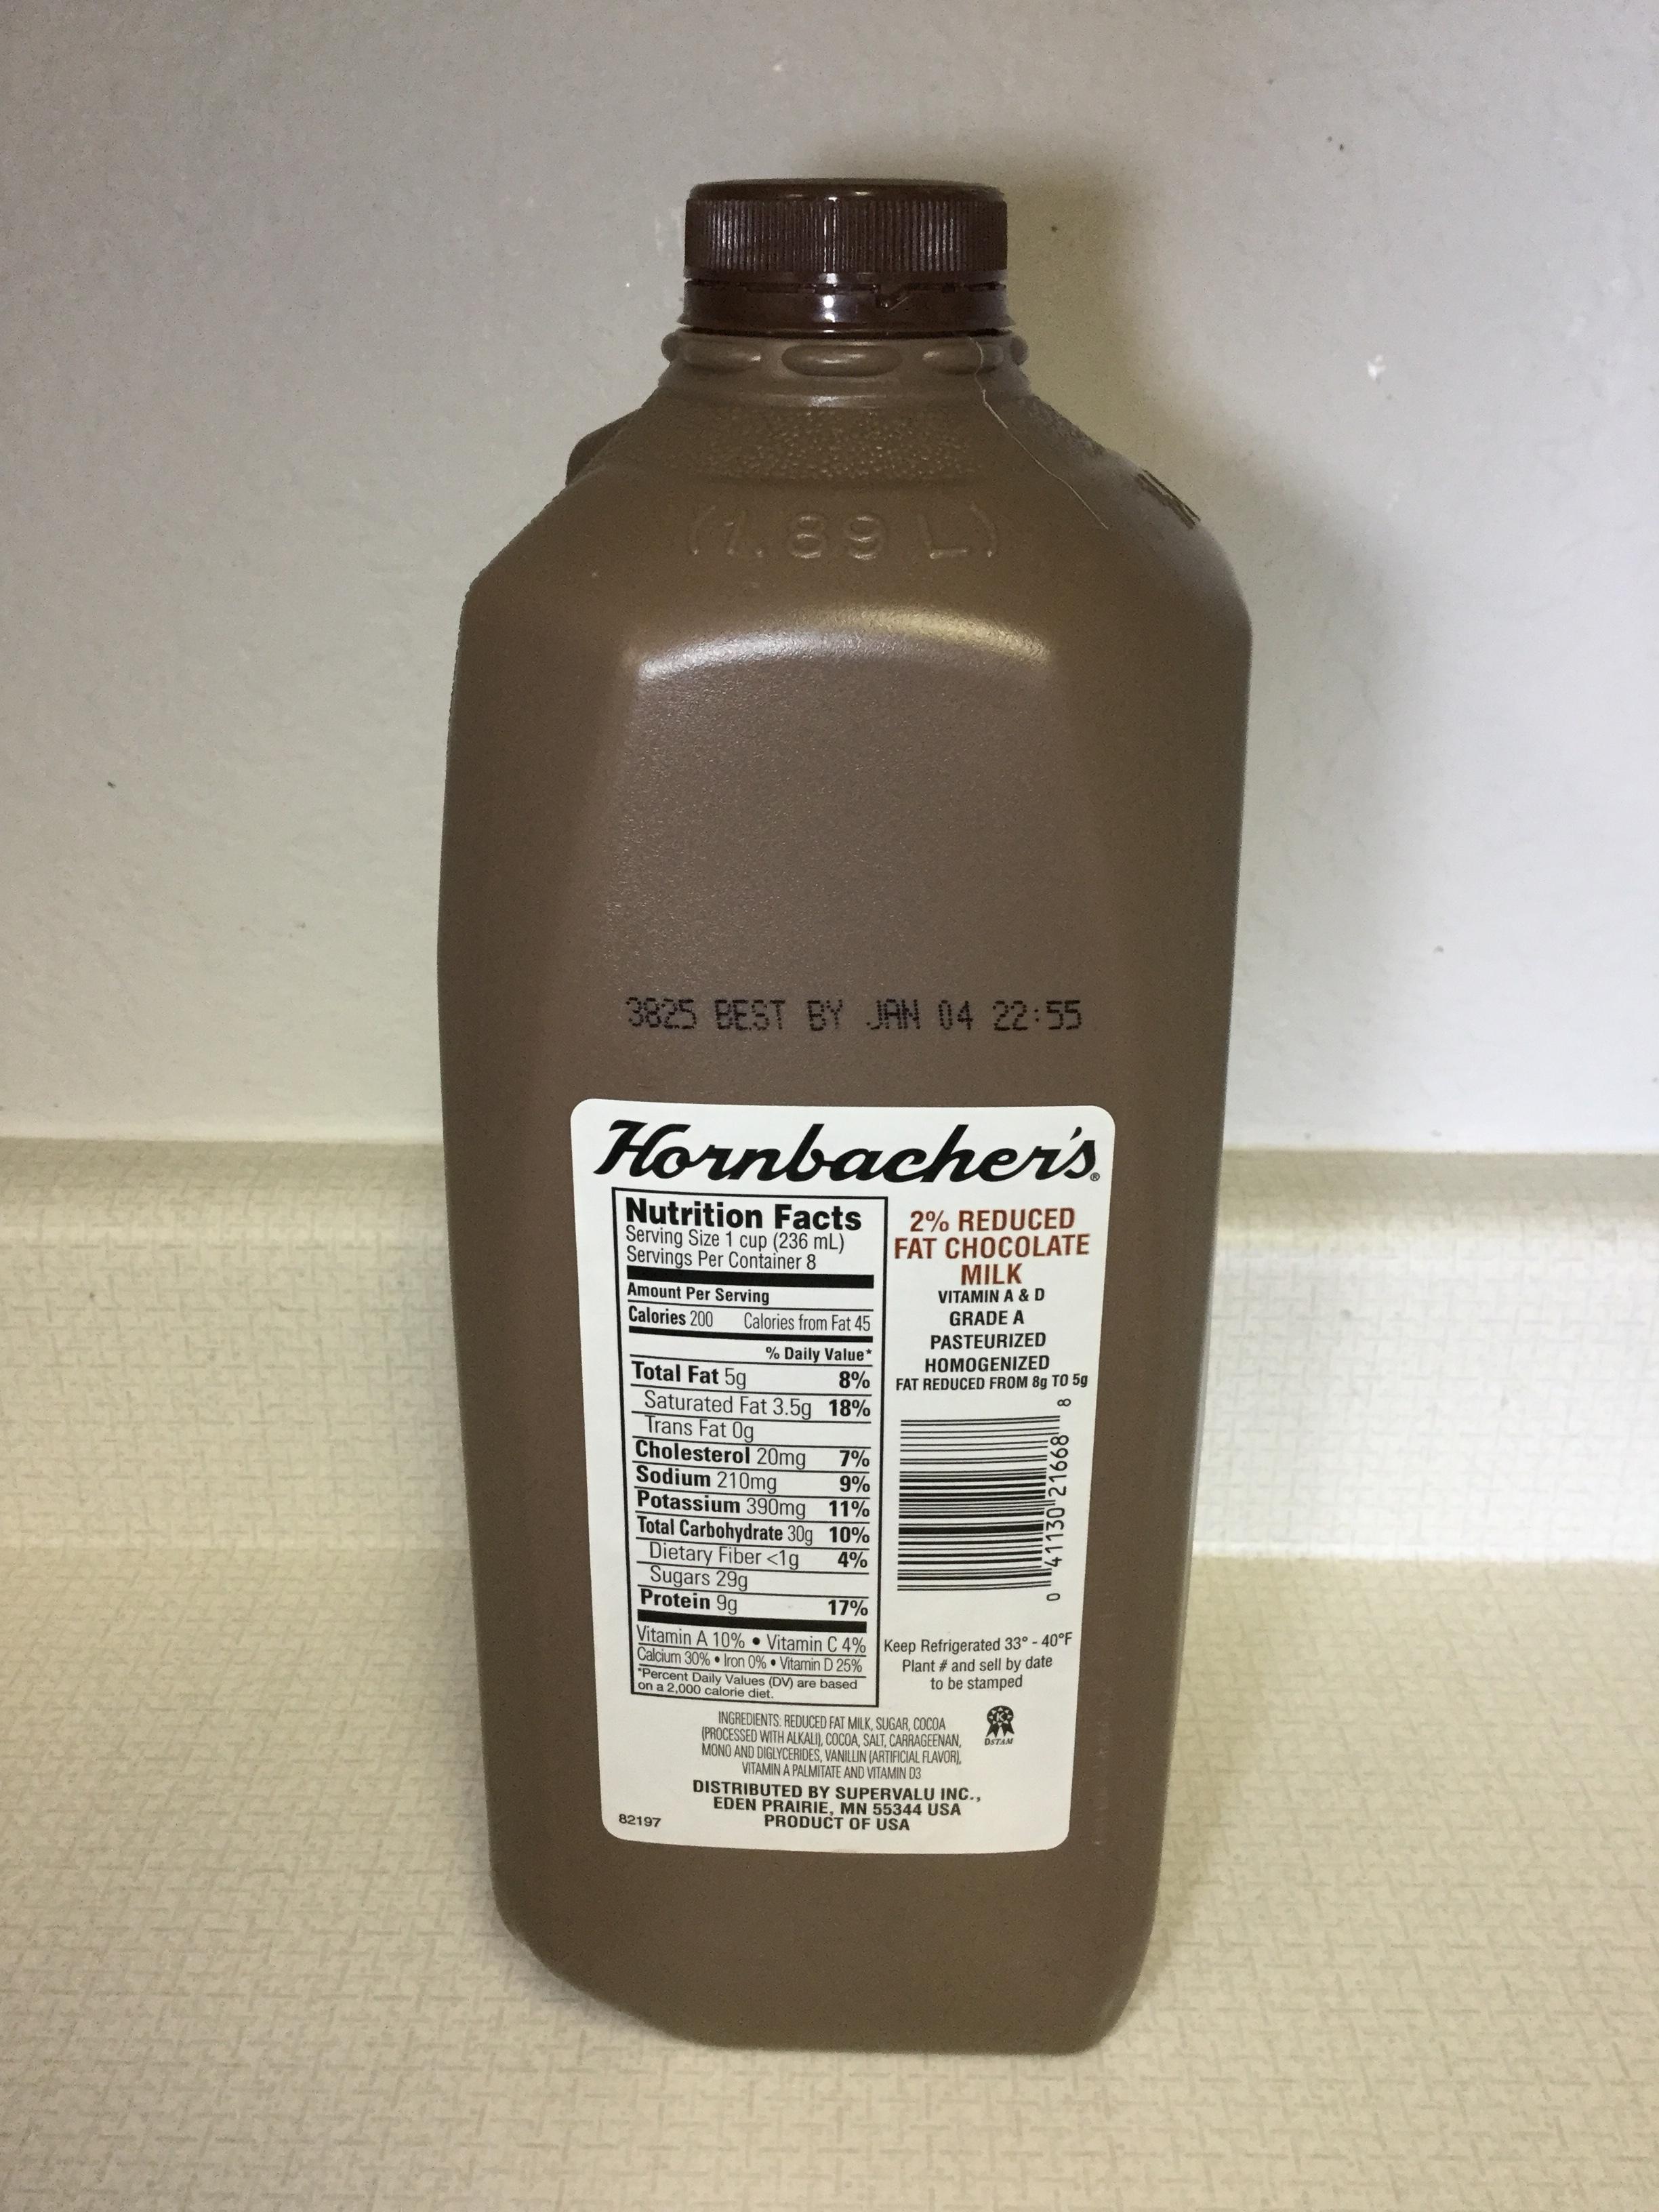 Hornbacher's 2% Reduced Fat Chocolate Milk Side 1